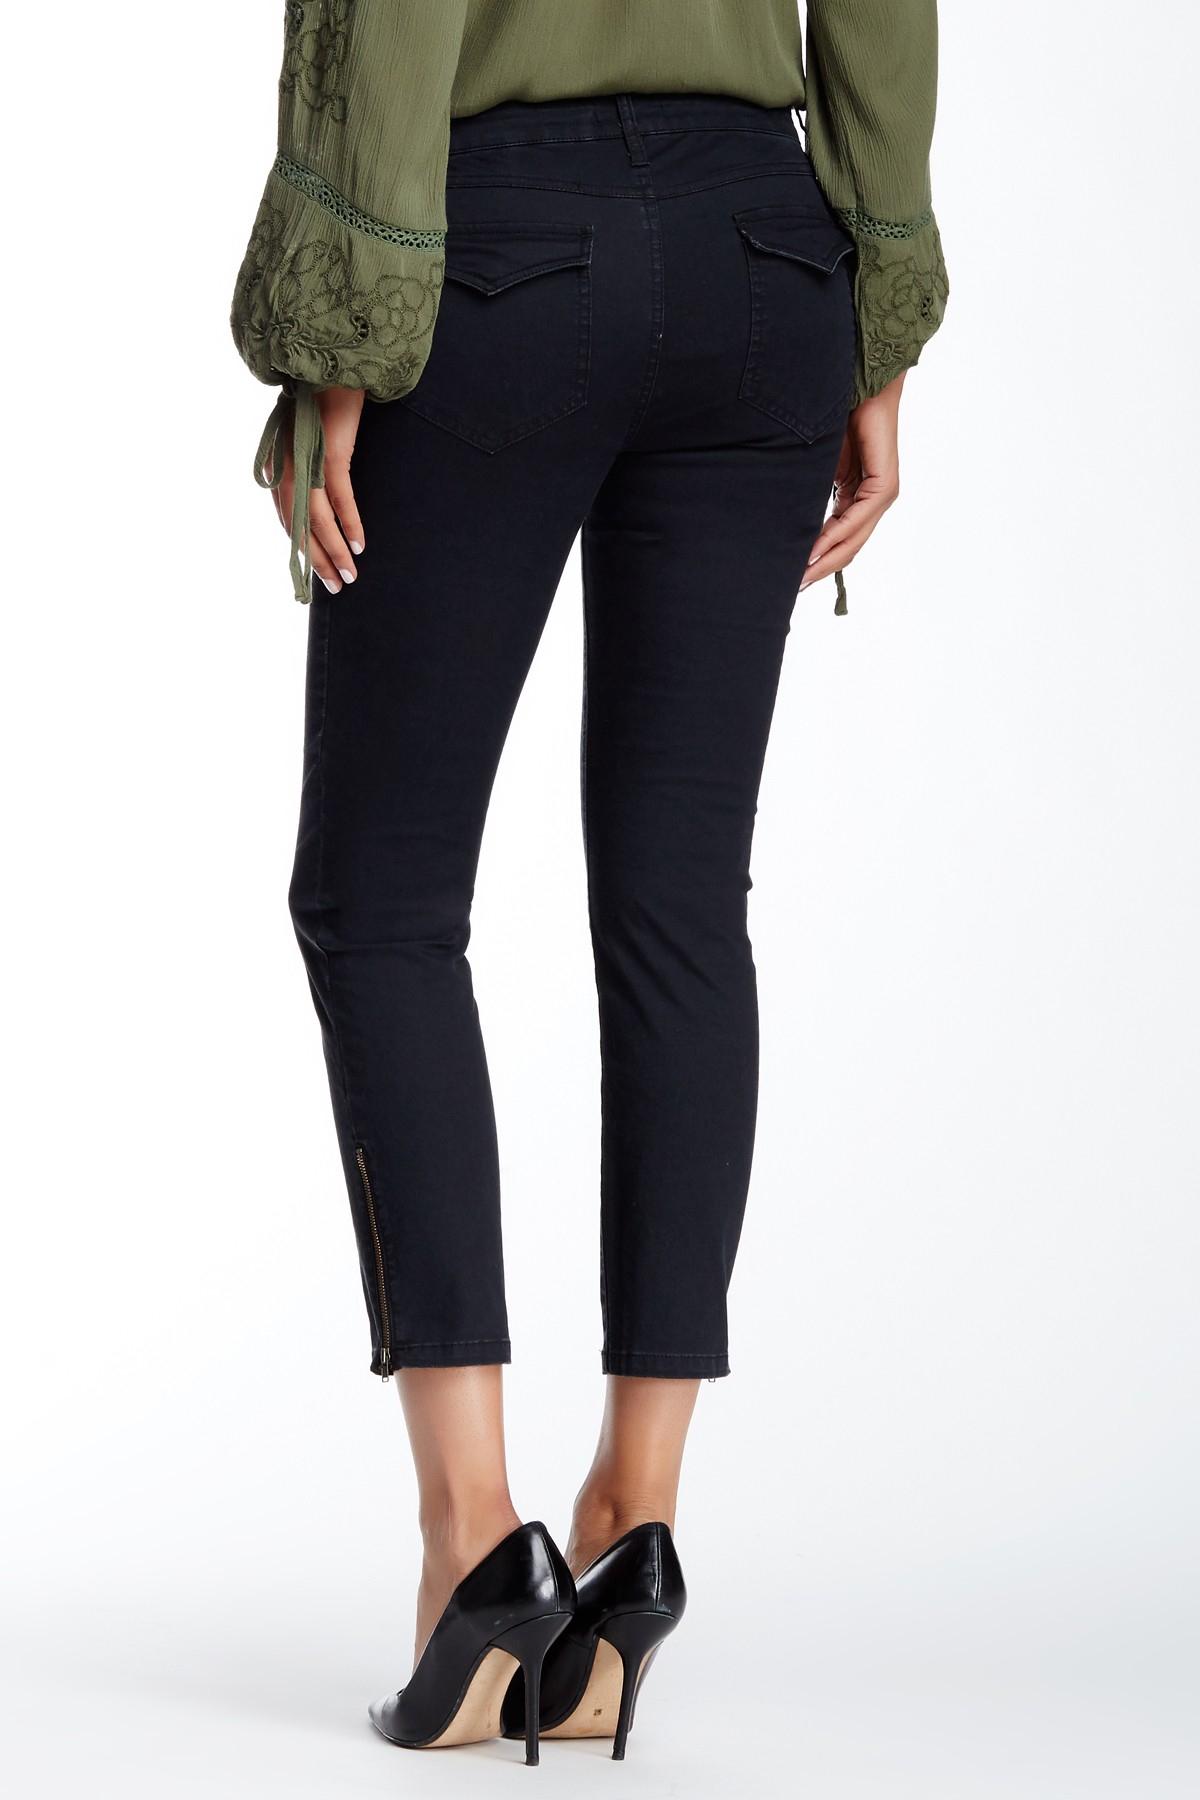 Isy u0026 ki Crop Skinny Cargo Jean in Black | Lyst